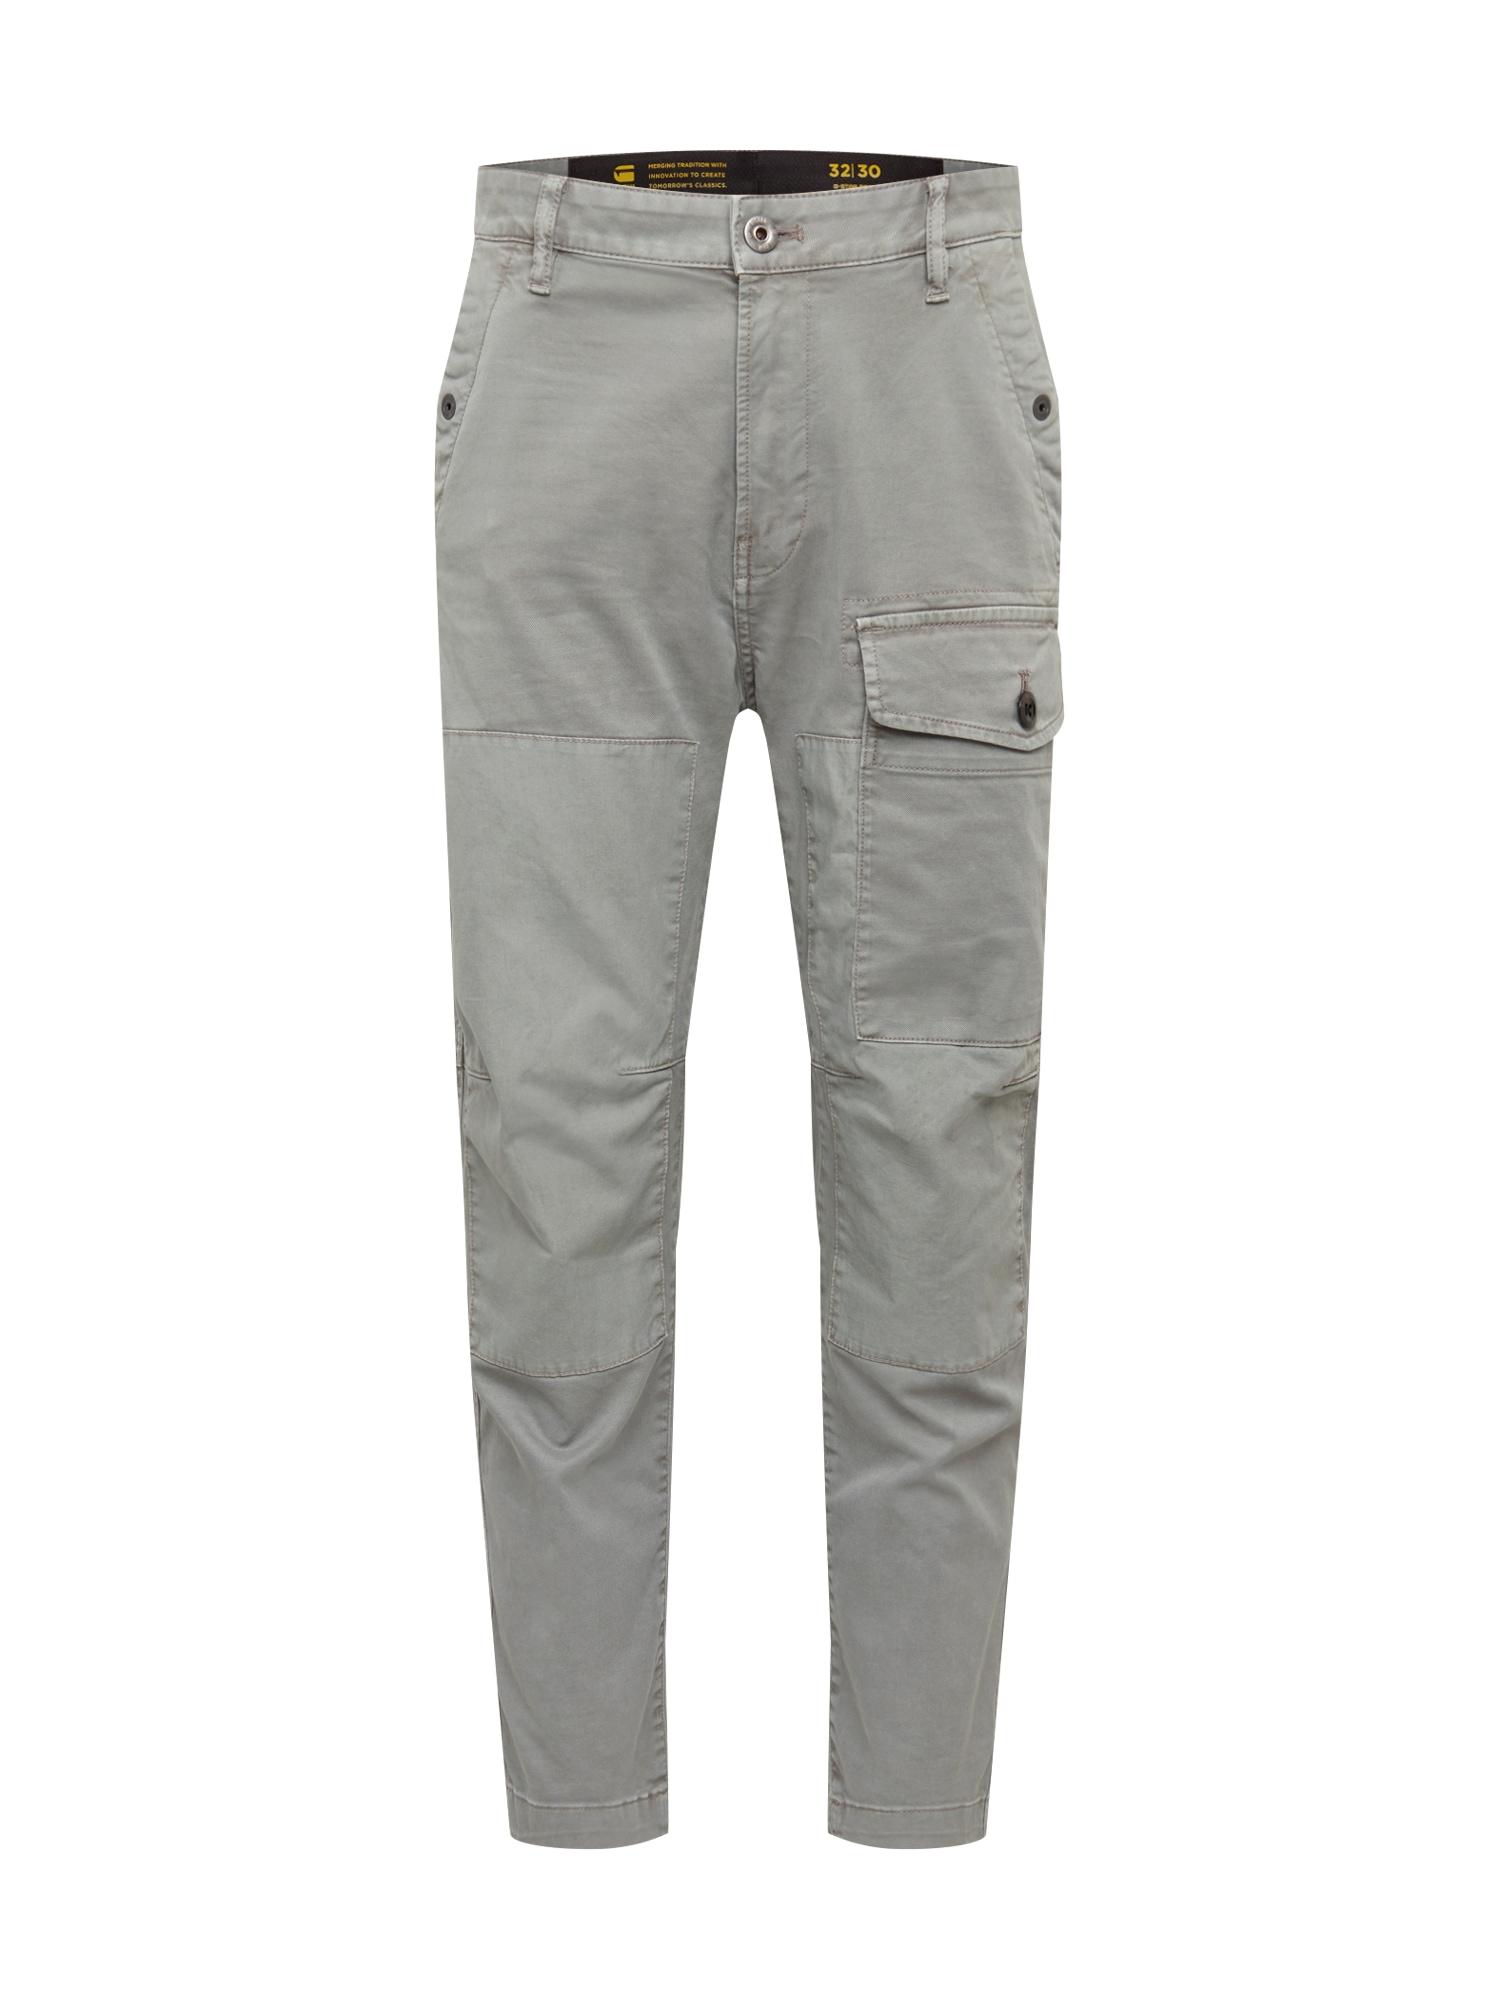 G-Star RAW Kalhoty 'Torrick'  šedá